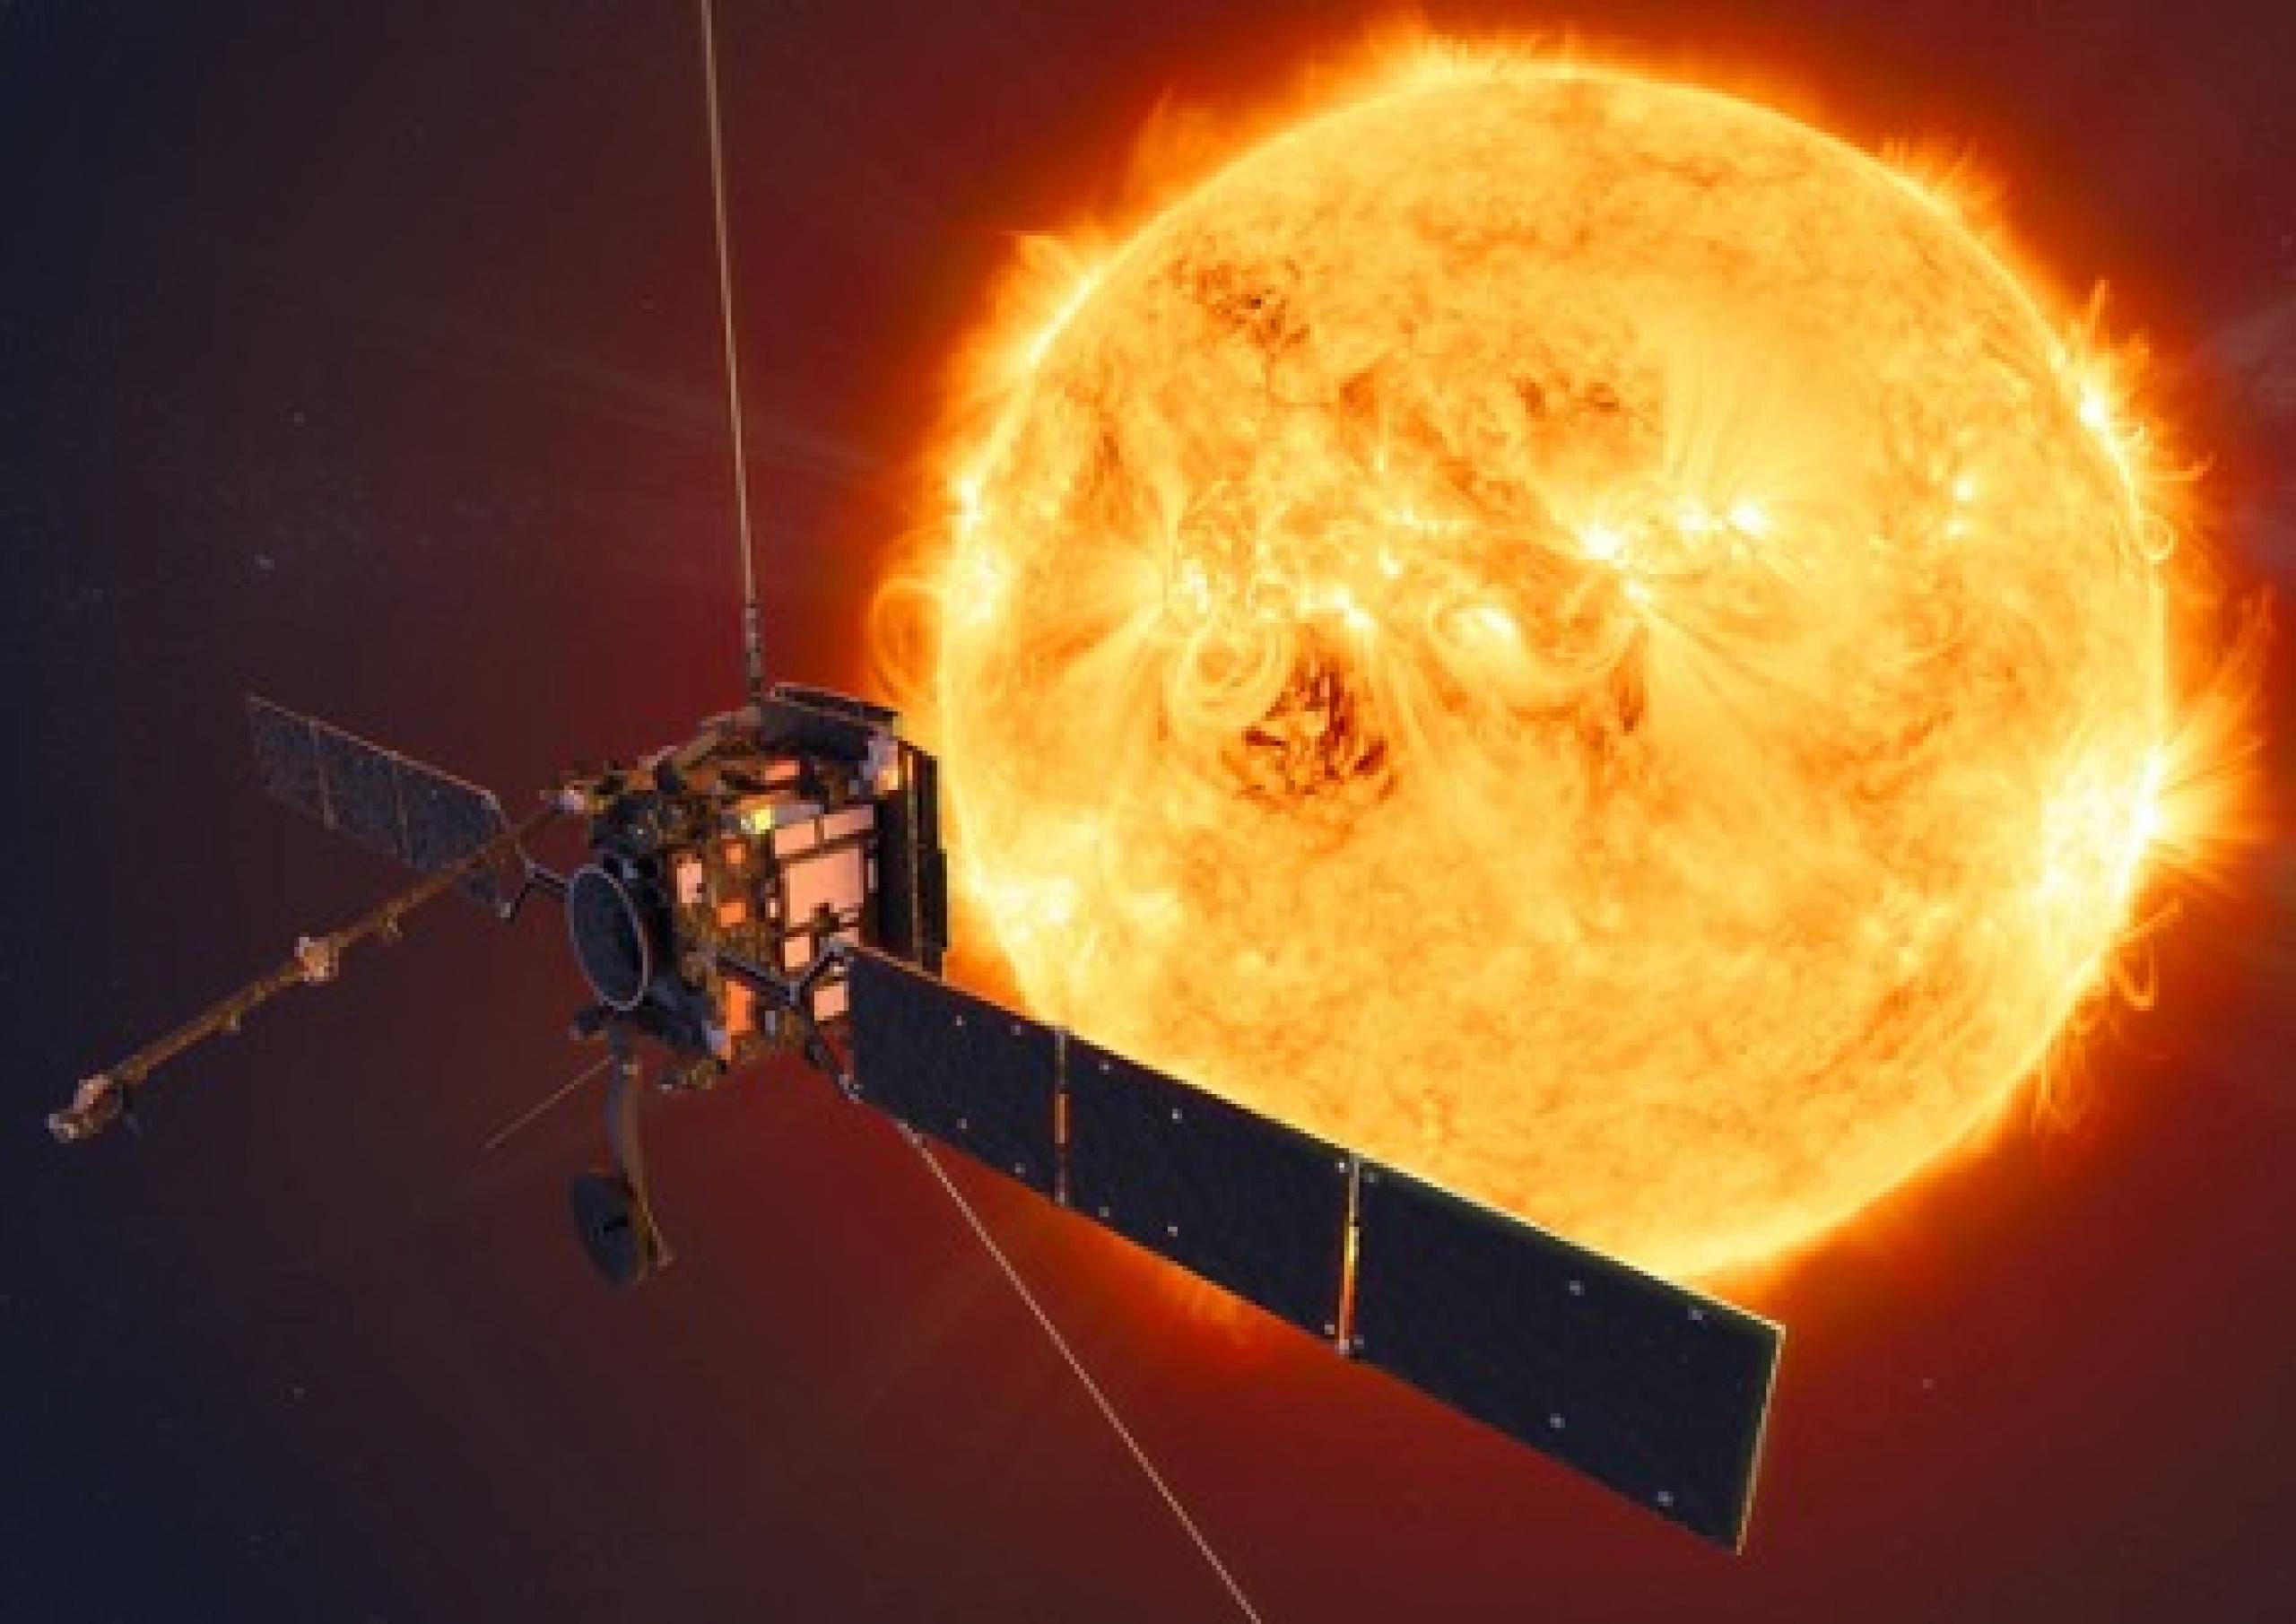 Image of satellite in front of orange sun